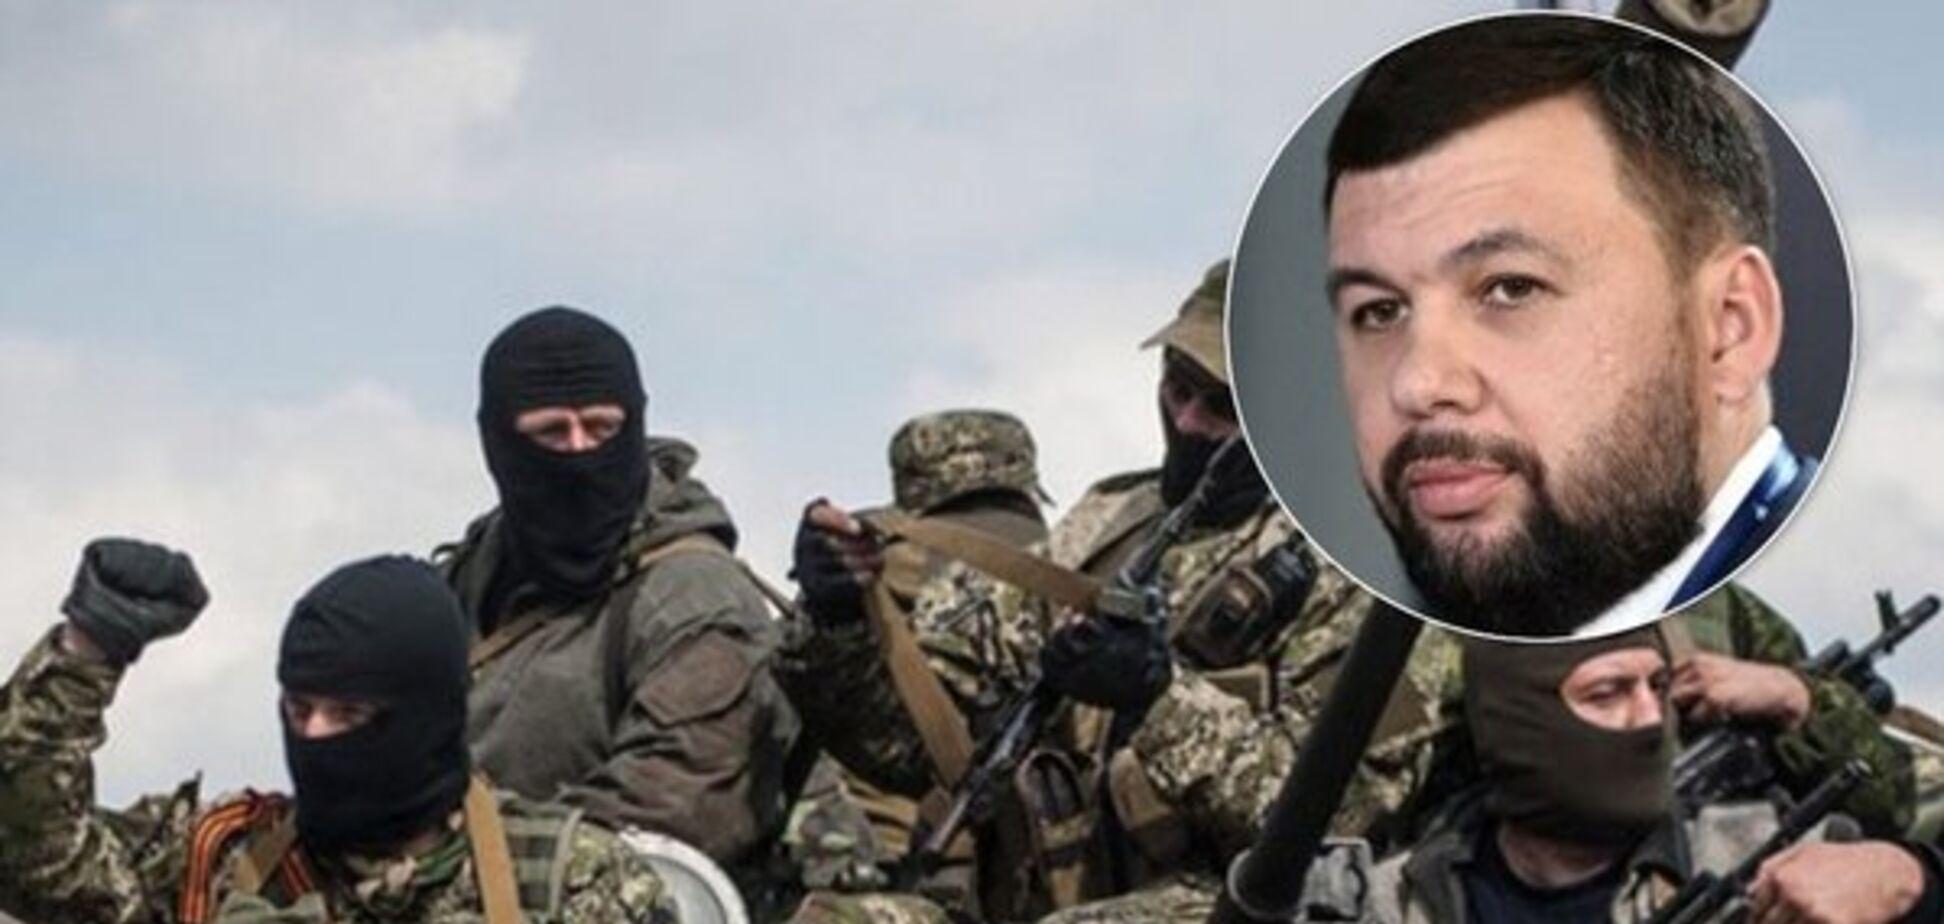 Пушилин превратил 'защитников ДНР' в пушечное мясо